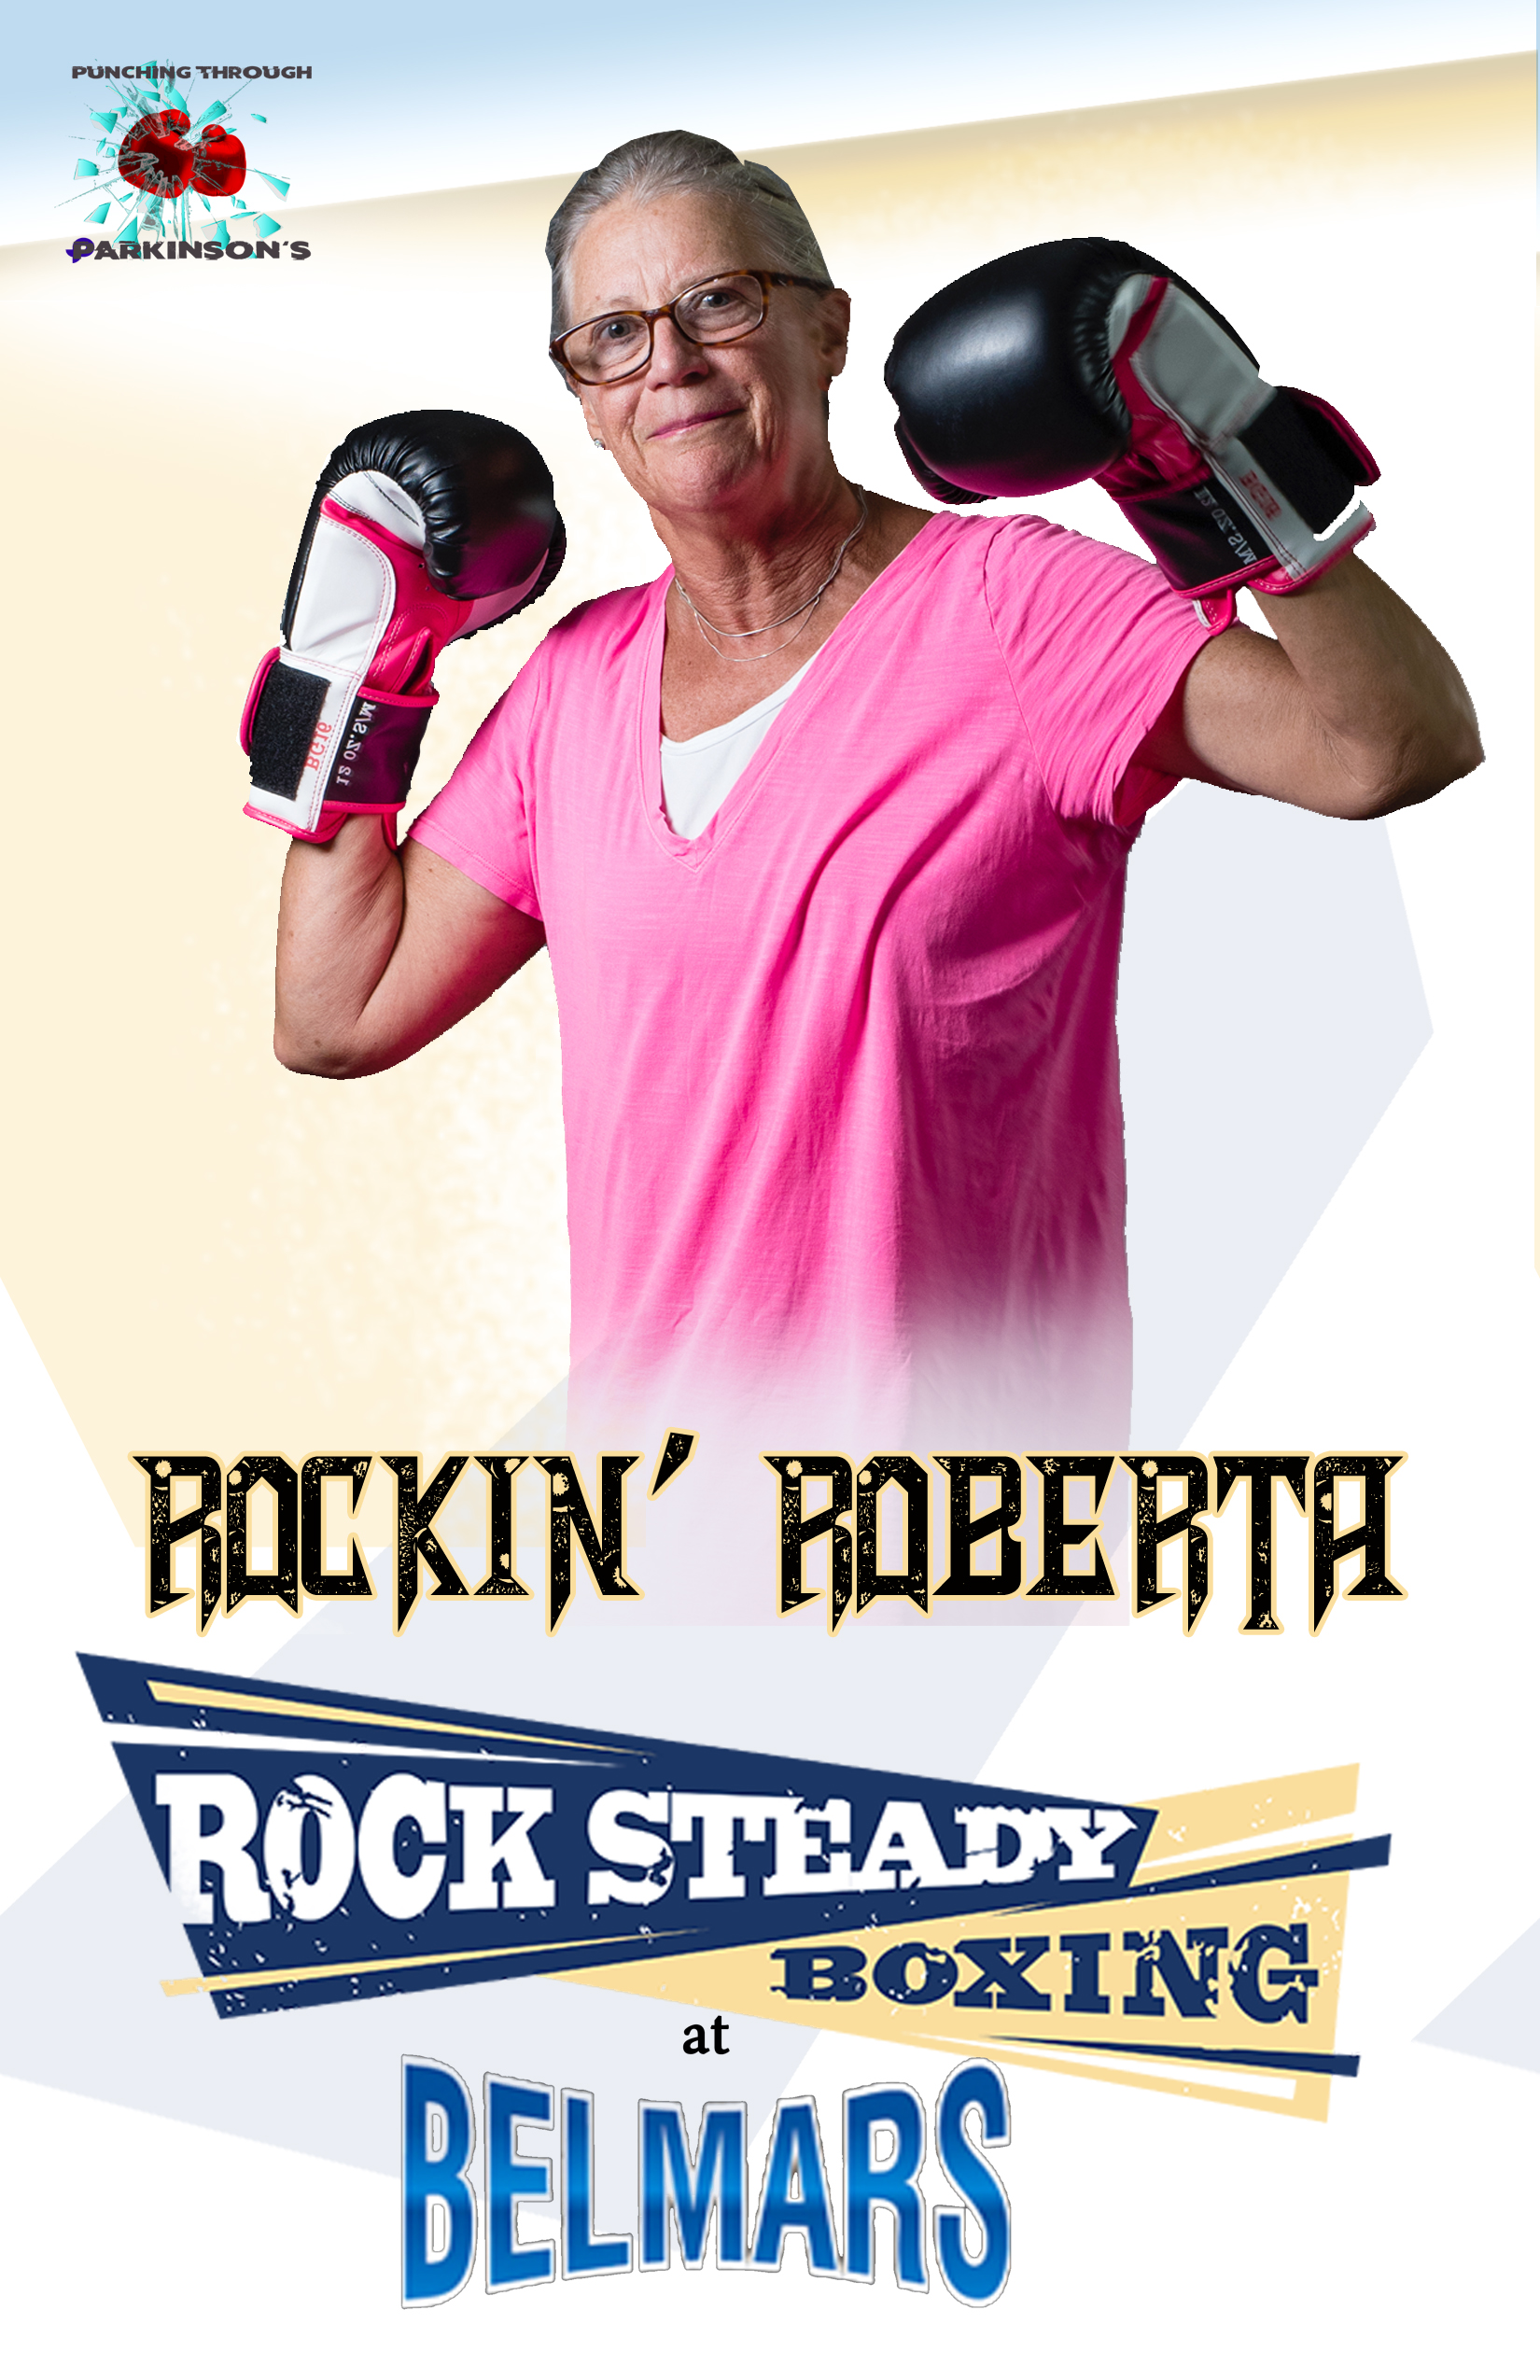 RSB Roberta